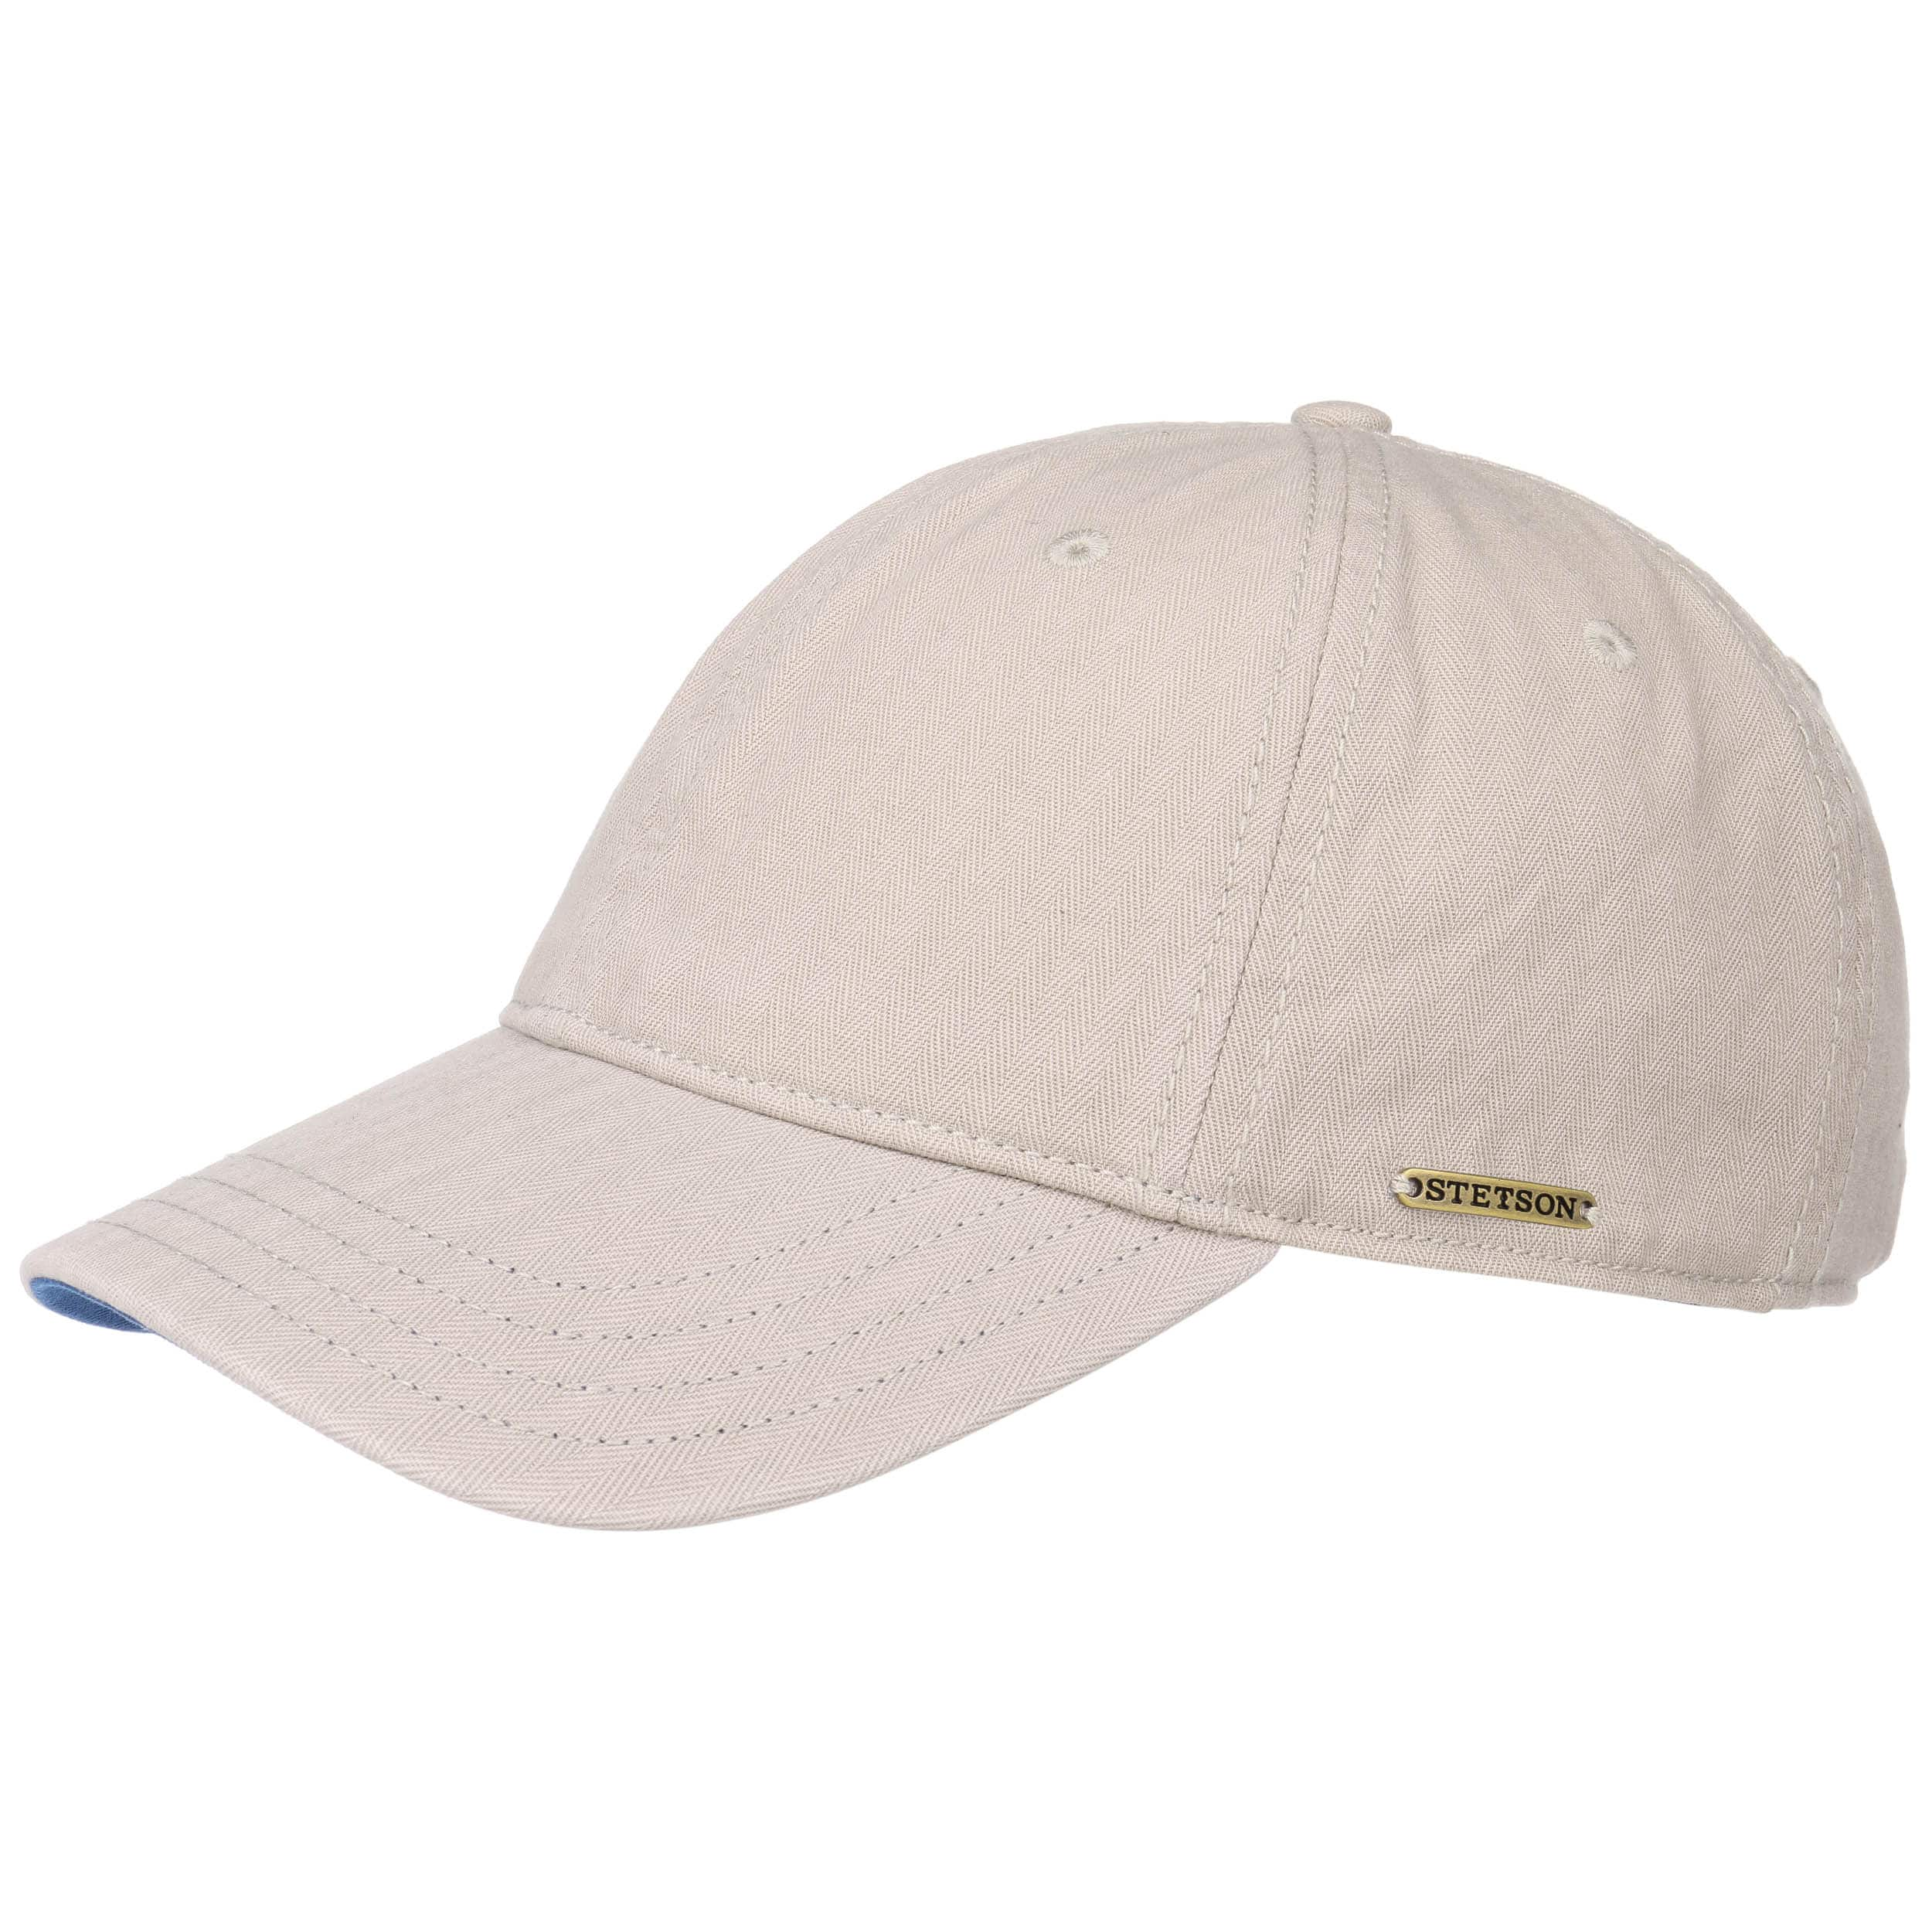 7f720a4199e ... Marshal Cotton Baseball Cap by Stetson - beige-blue 5 ...